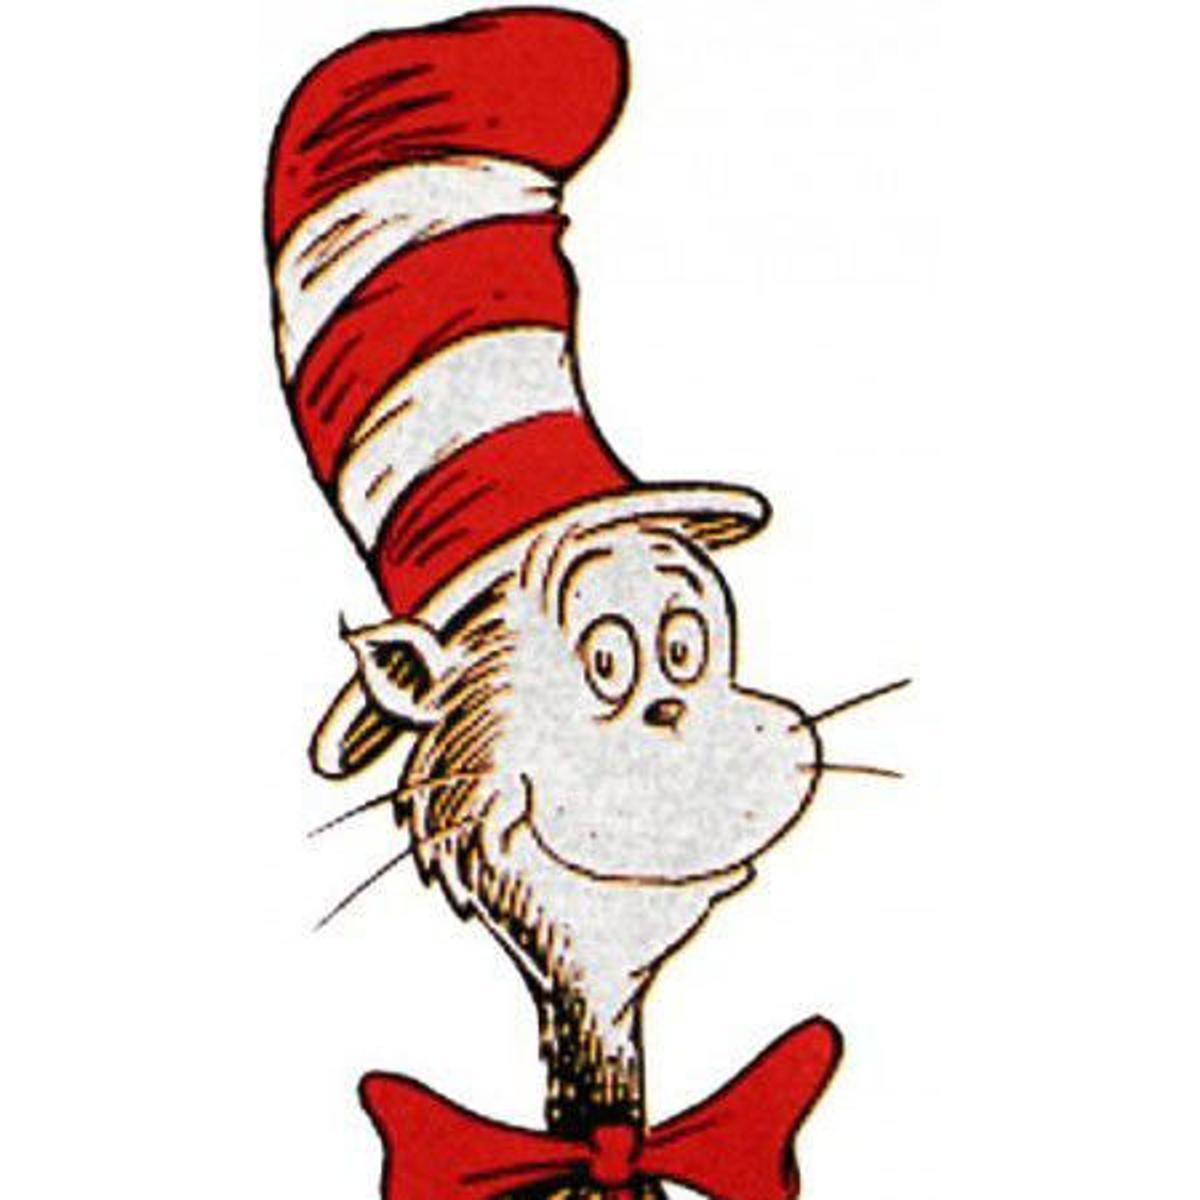 c7981555c5d How racist are Dr. Seuss  children s books